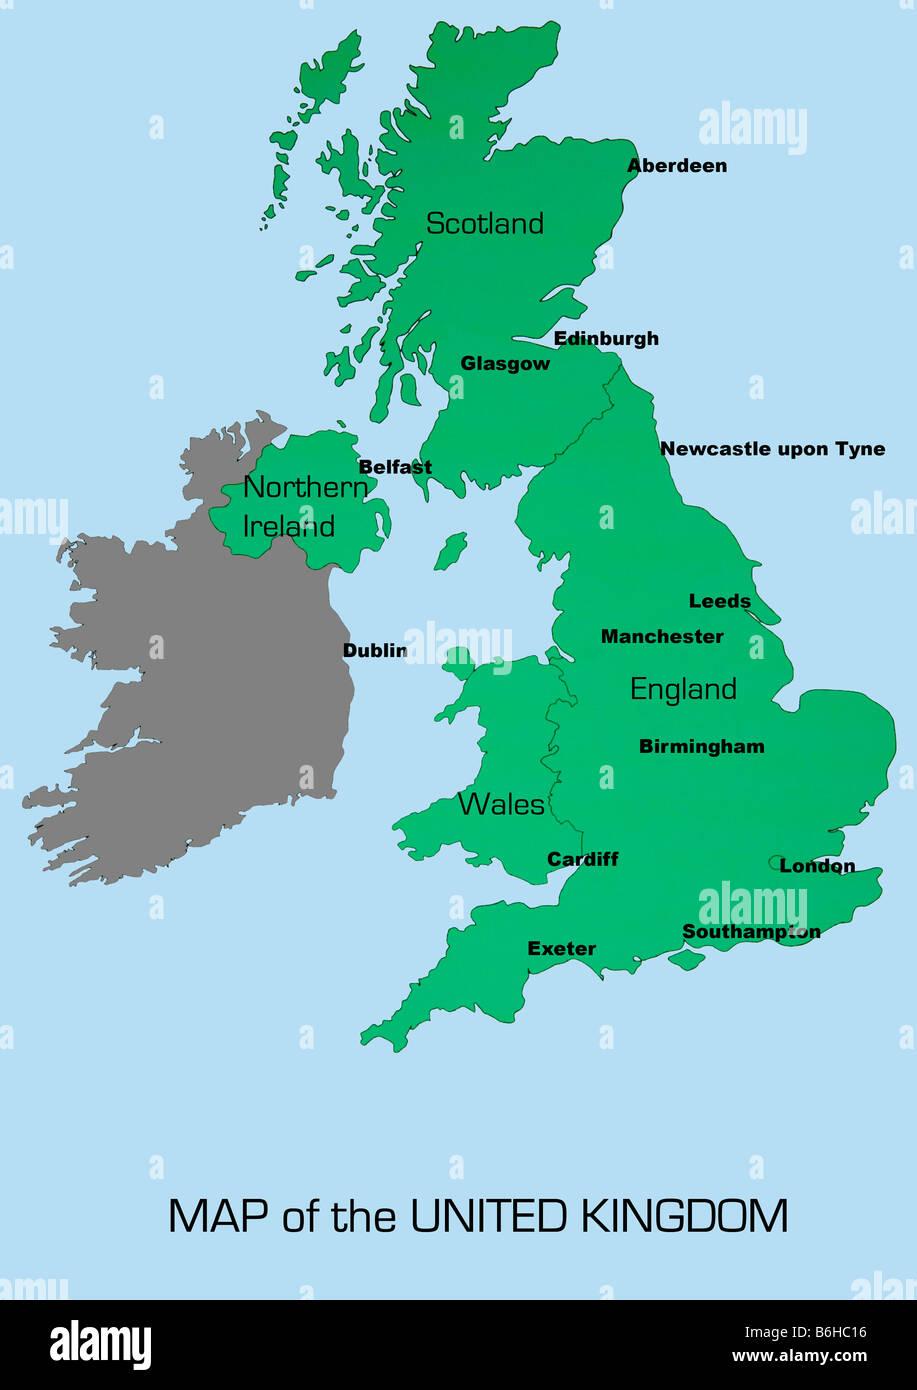 Carte Angleterre Ecosse.Uk Carte Montrant L Angleterre Ecosse Pays De Galles Et Irlande Du